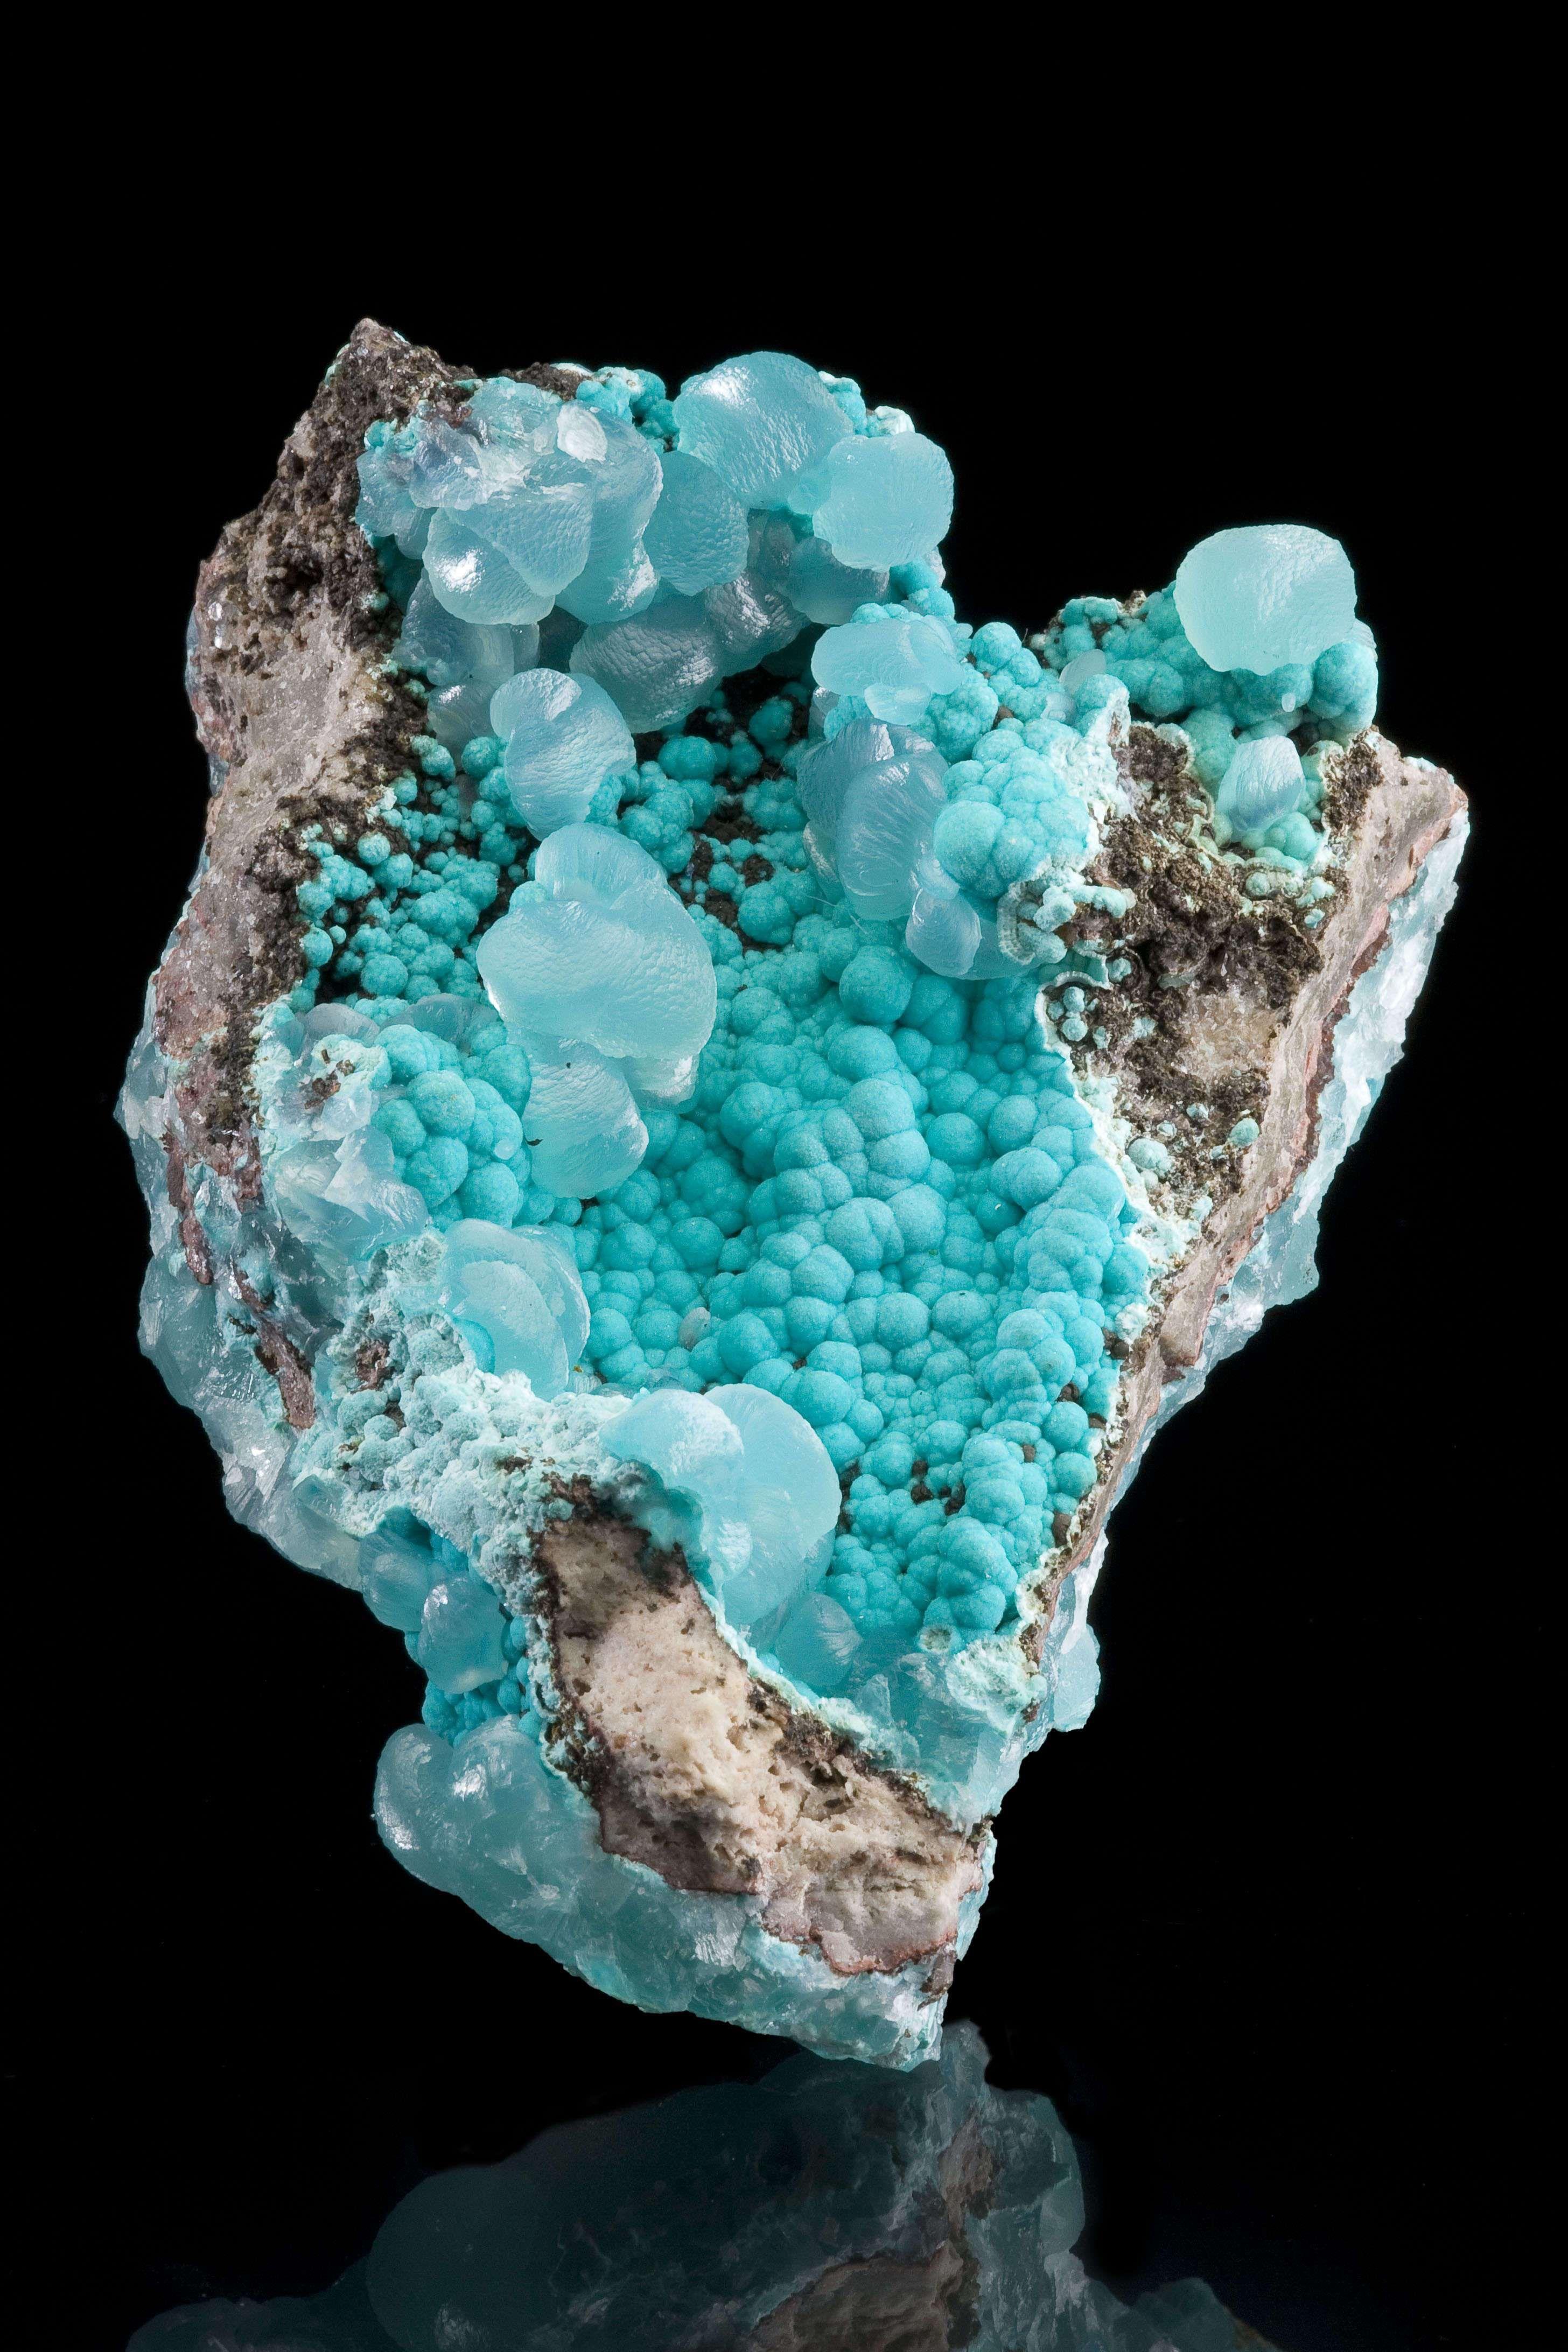 raw fluorite fluorite specimen polished stones Aqua blue fluorite Rocks minerals Big Natural Fluorite crystal in matrix from New Mexico